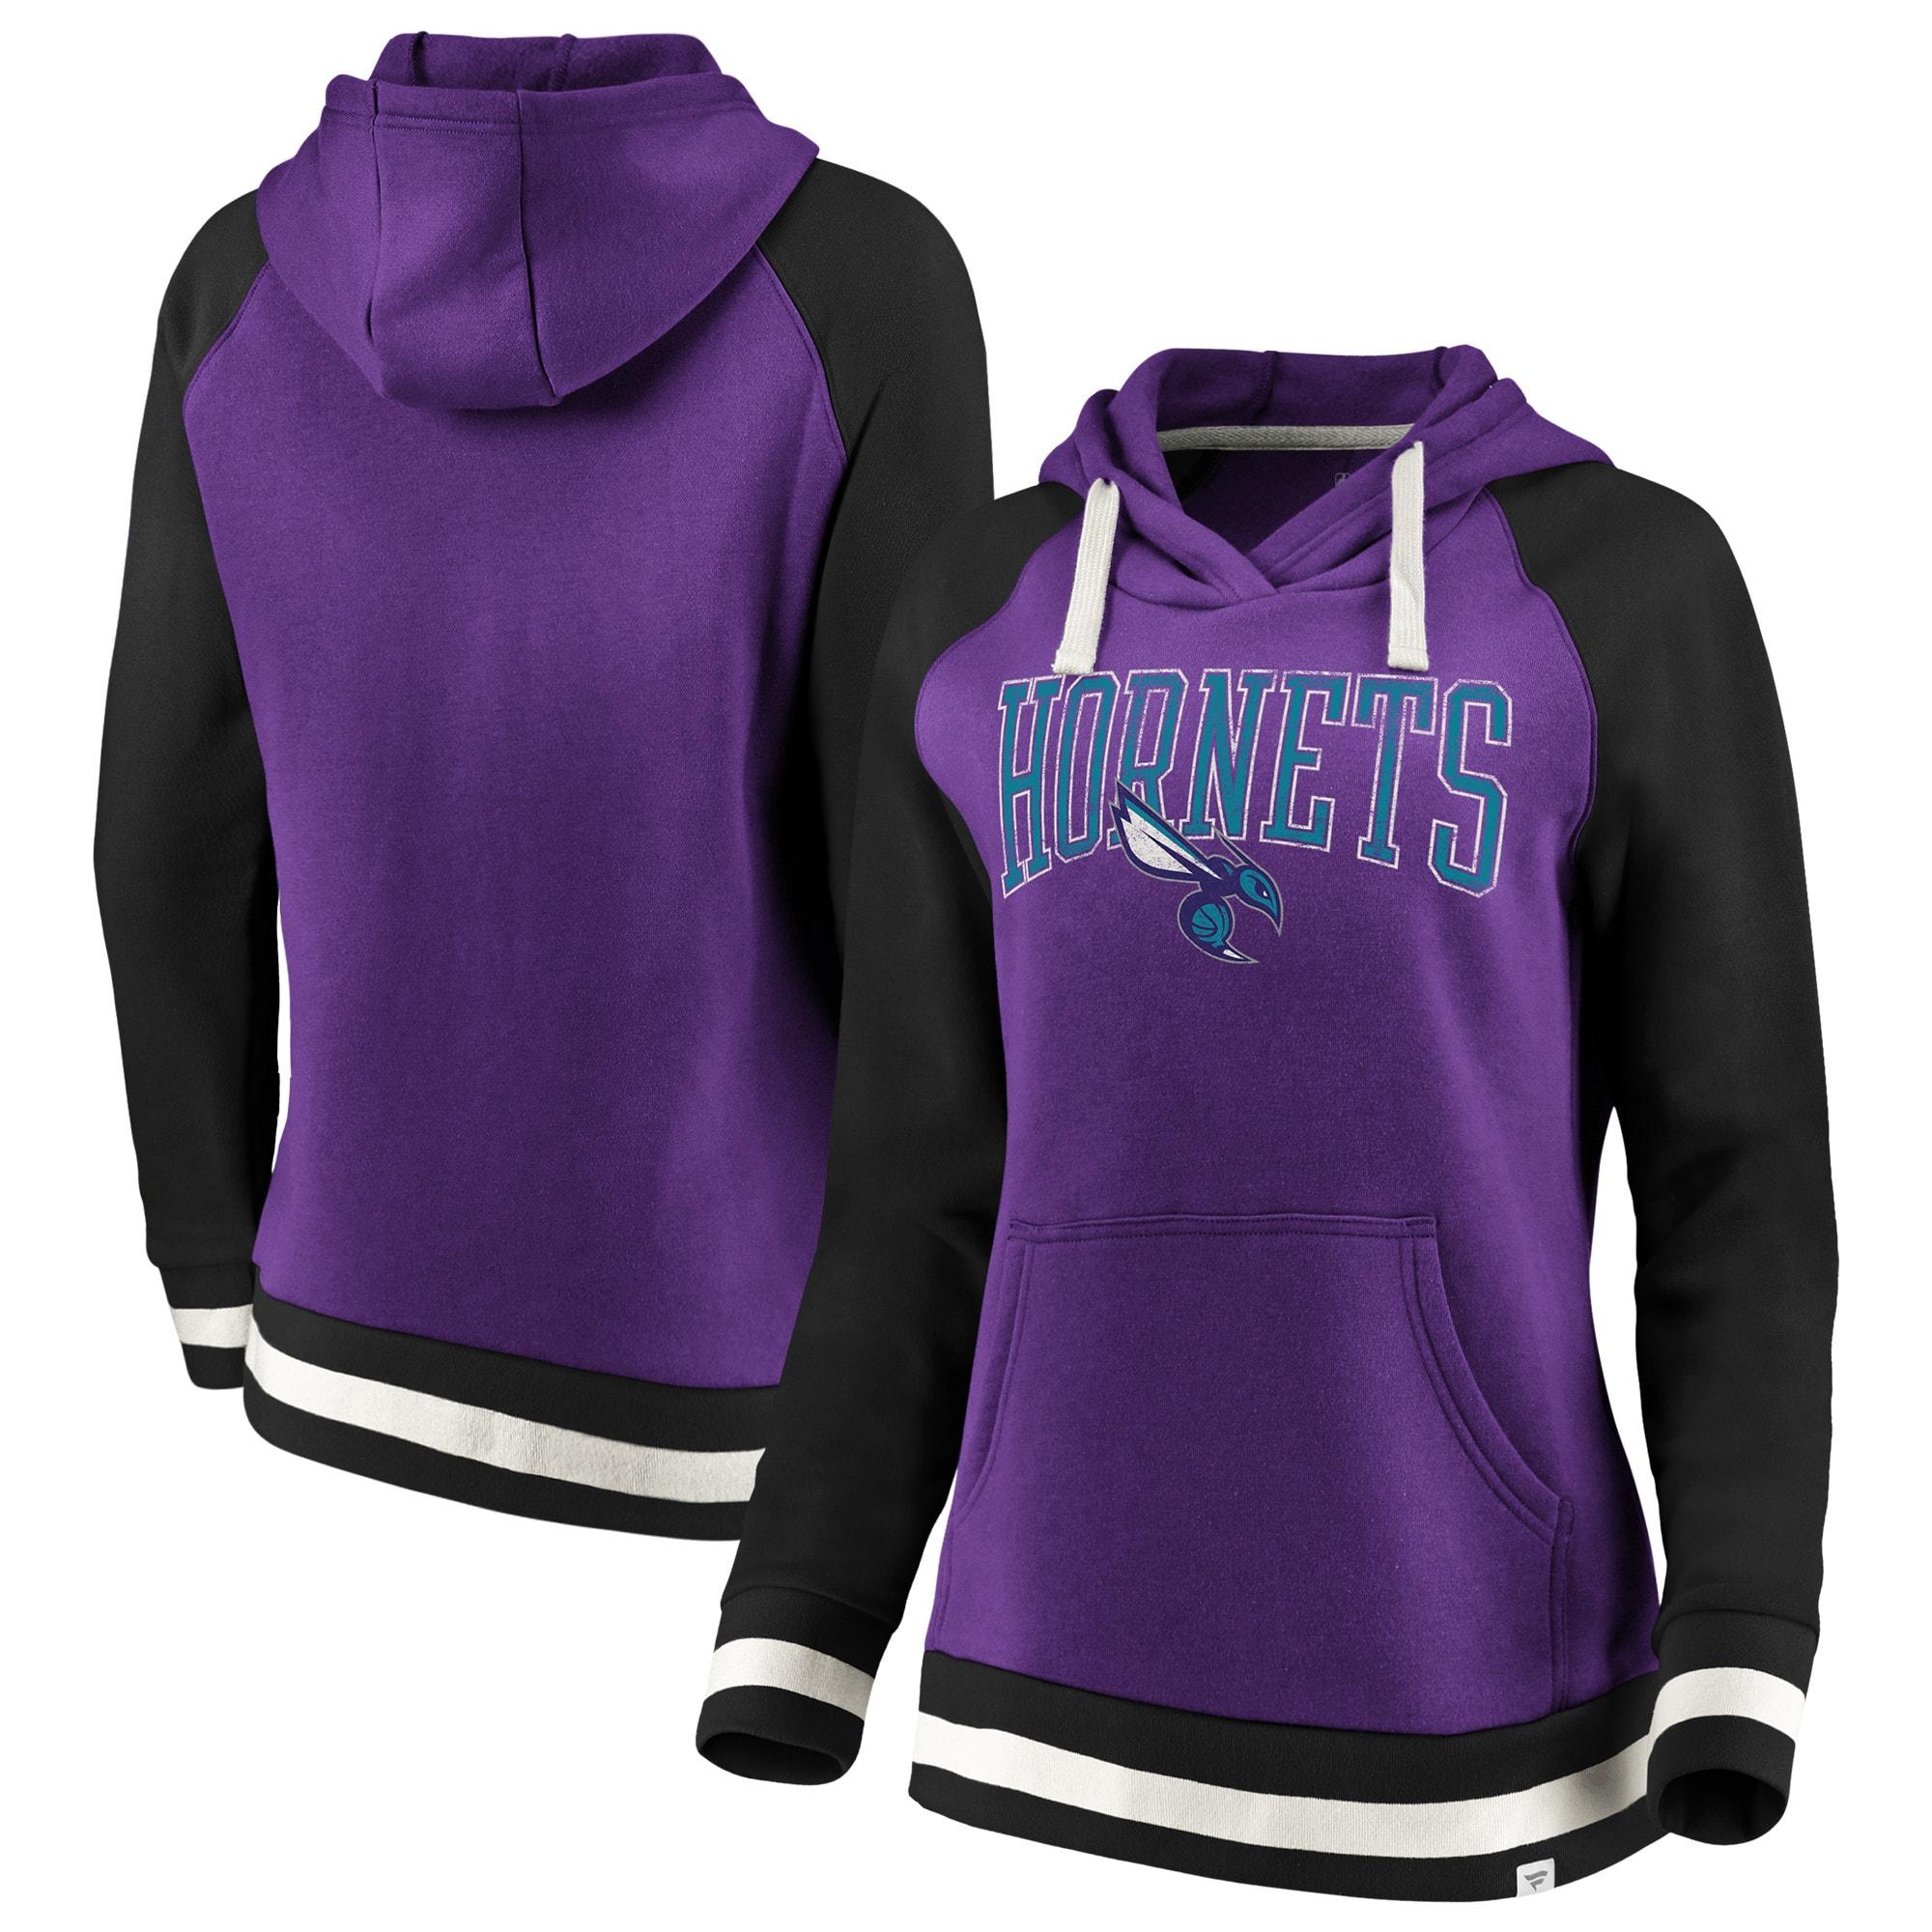 Charlotte Hornets Fanatics Branded Women's True Classic Vintage Retro Stripe Raglan Fleece Pullover Hoodie - Purple/Black